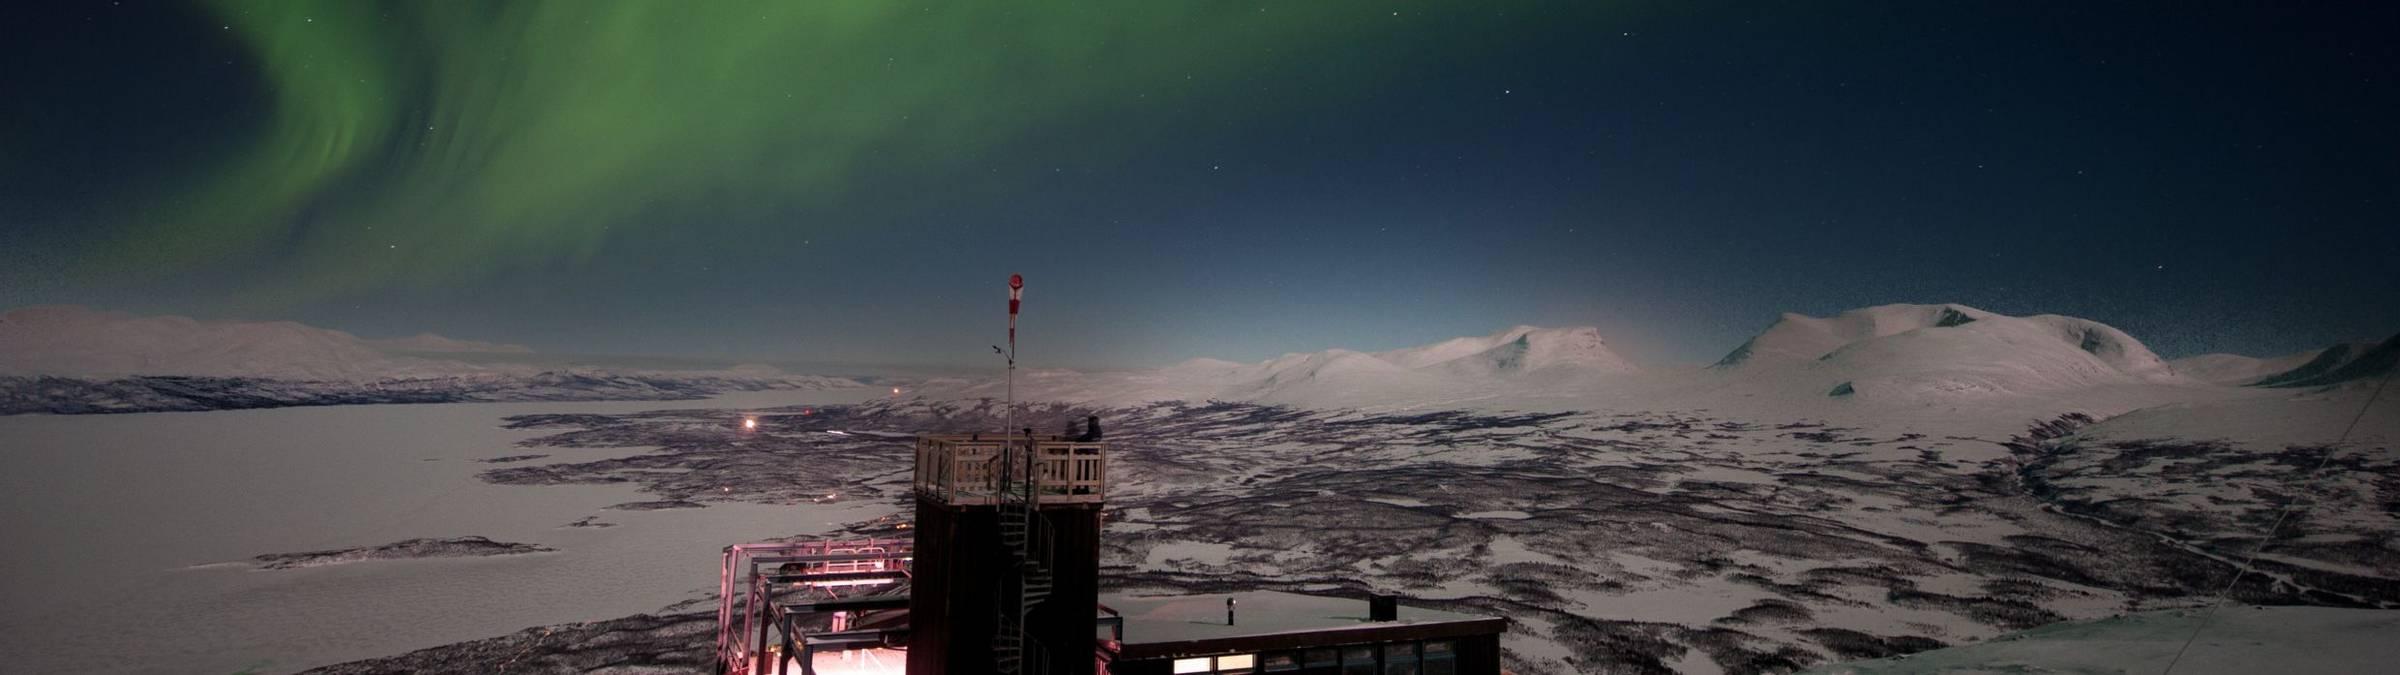 lola_akinmade_åkerström-northern_lights- abisko.jpg